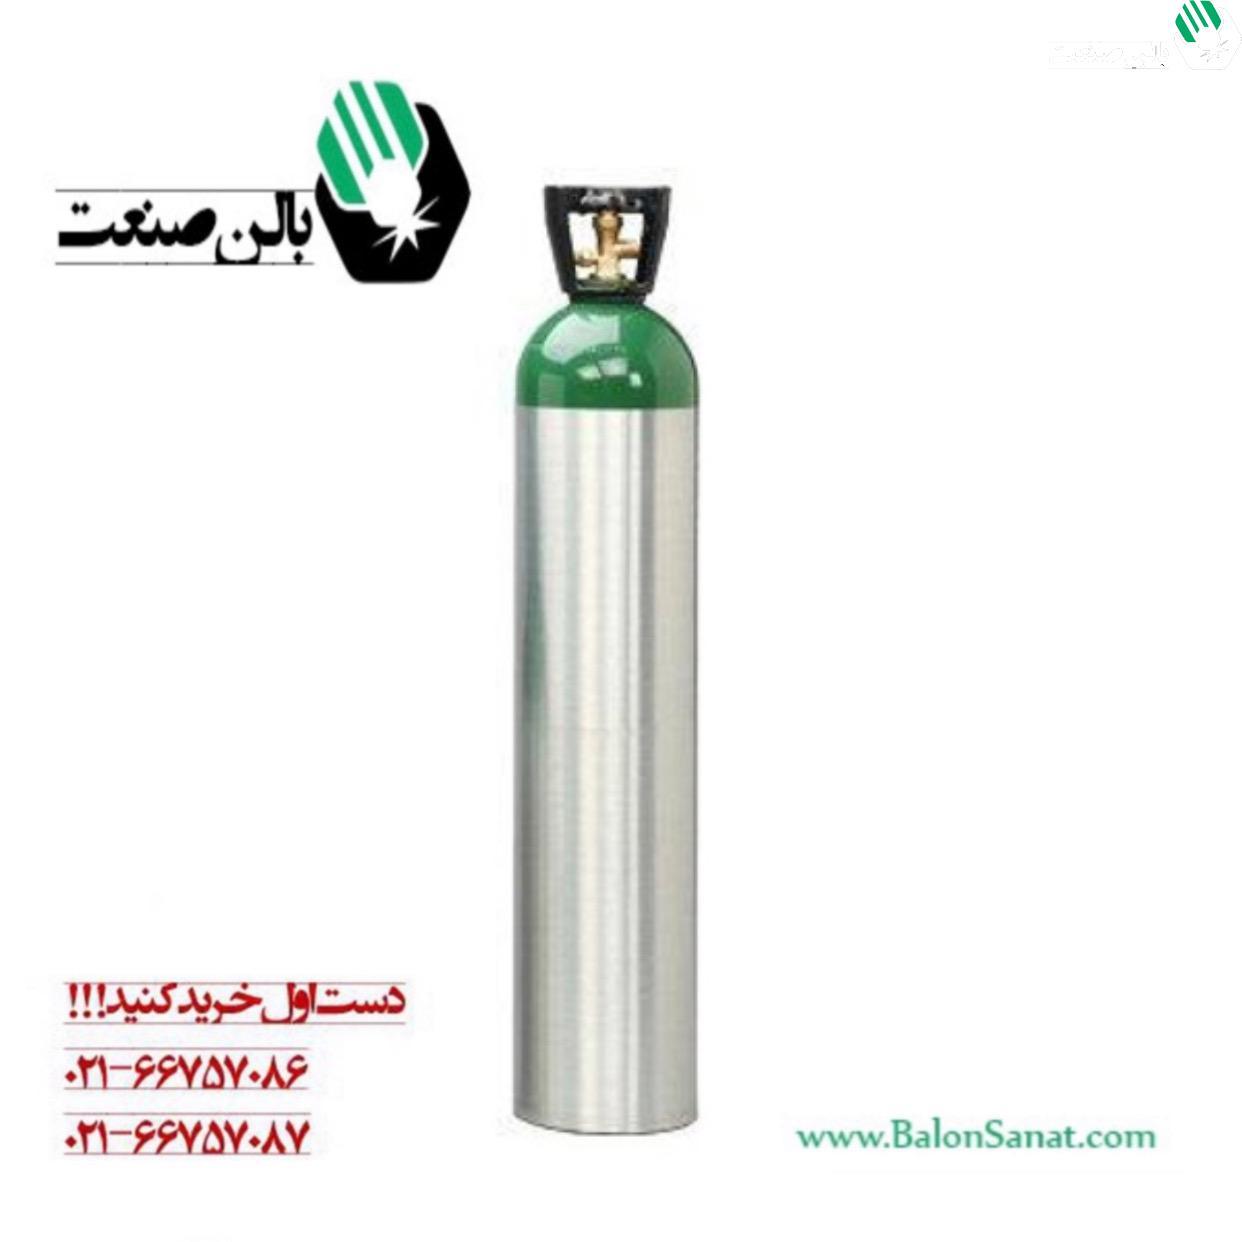 کپسول آلومینیومی ۱۰ لیتری اکسیژن